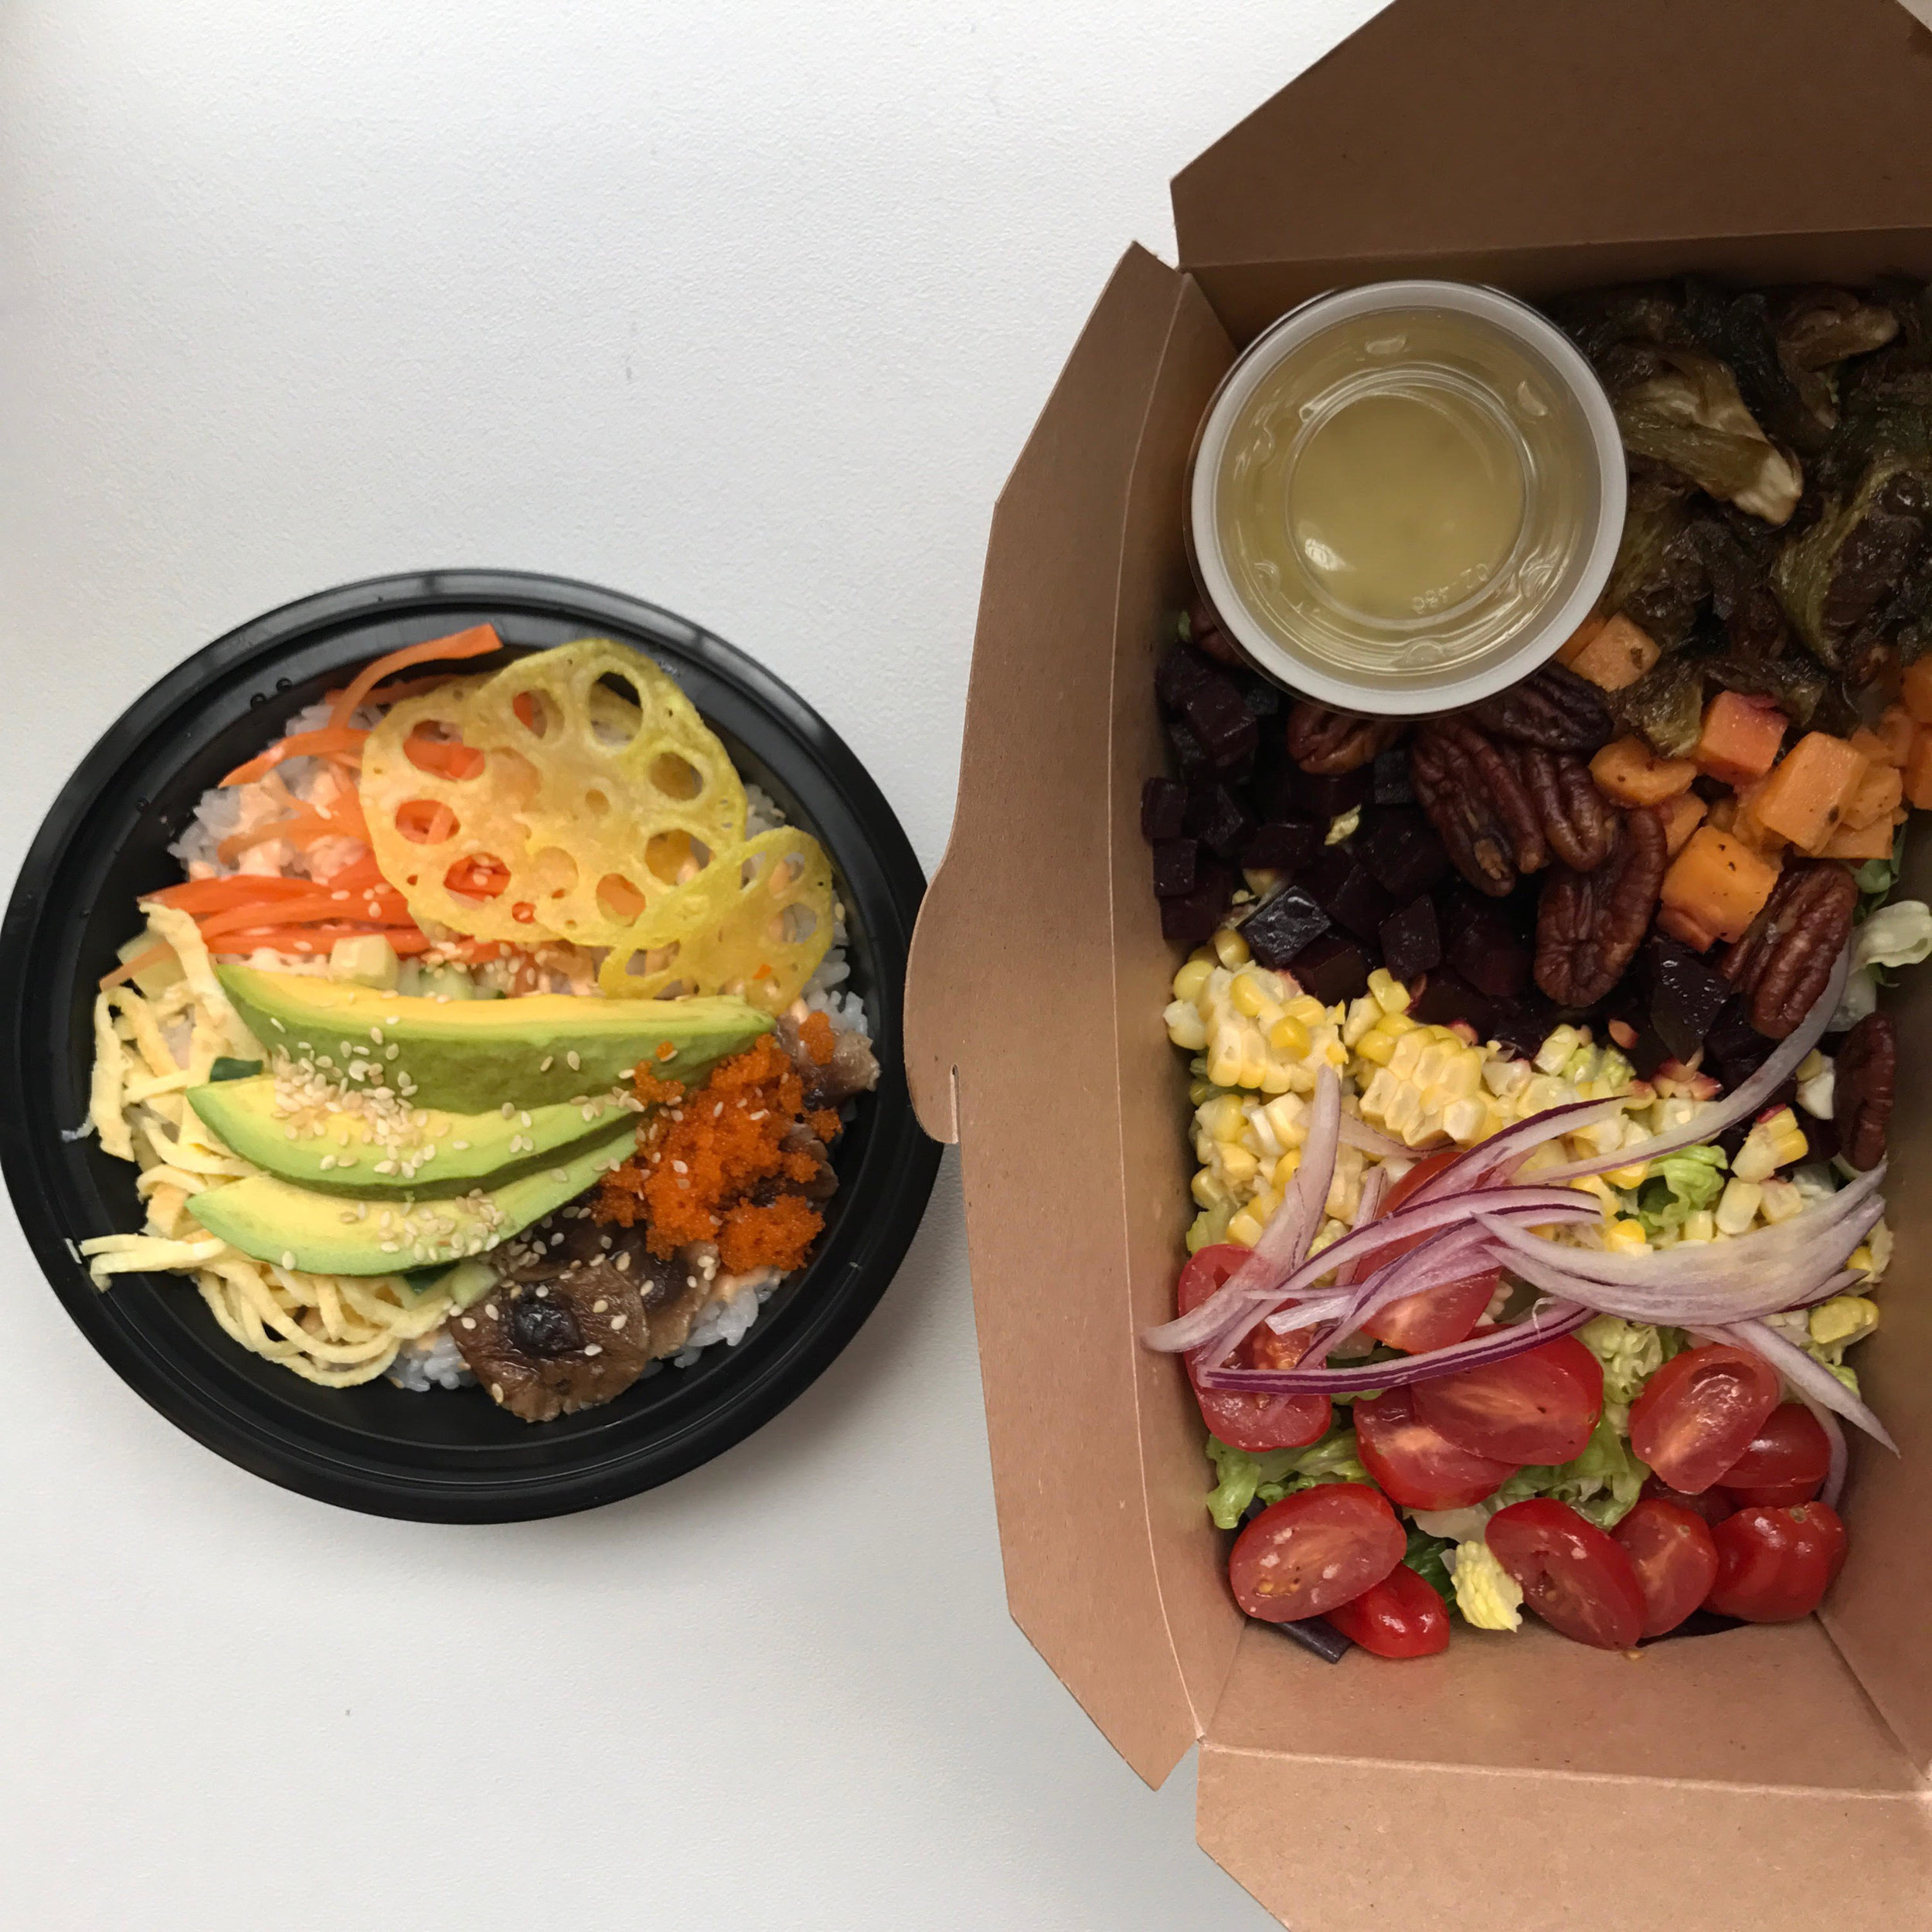 Try the Avocado Chirashi Sushi Bowl or the Rainbow Salad